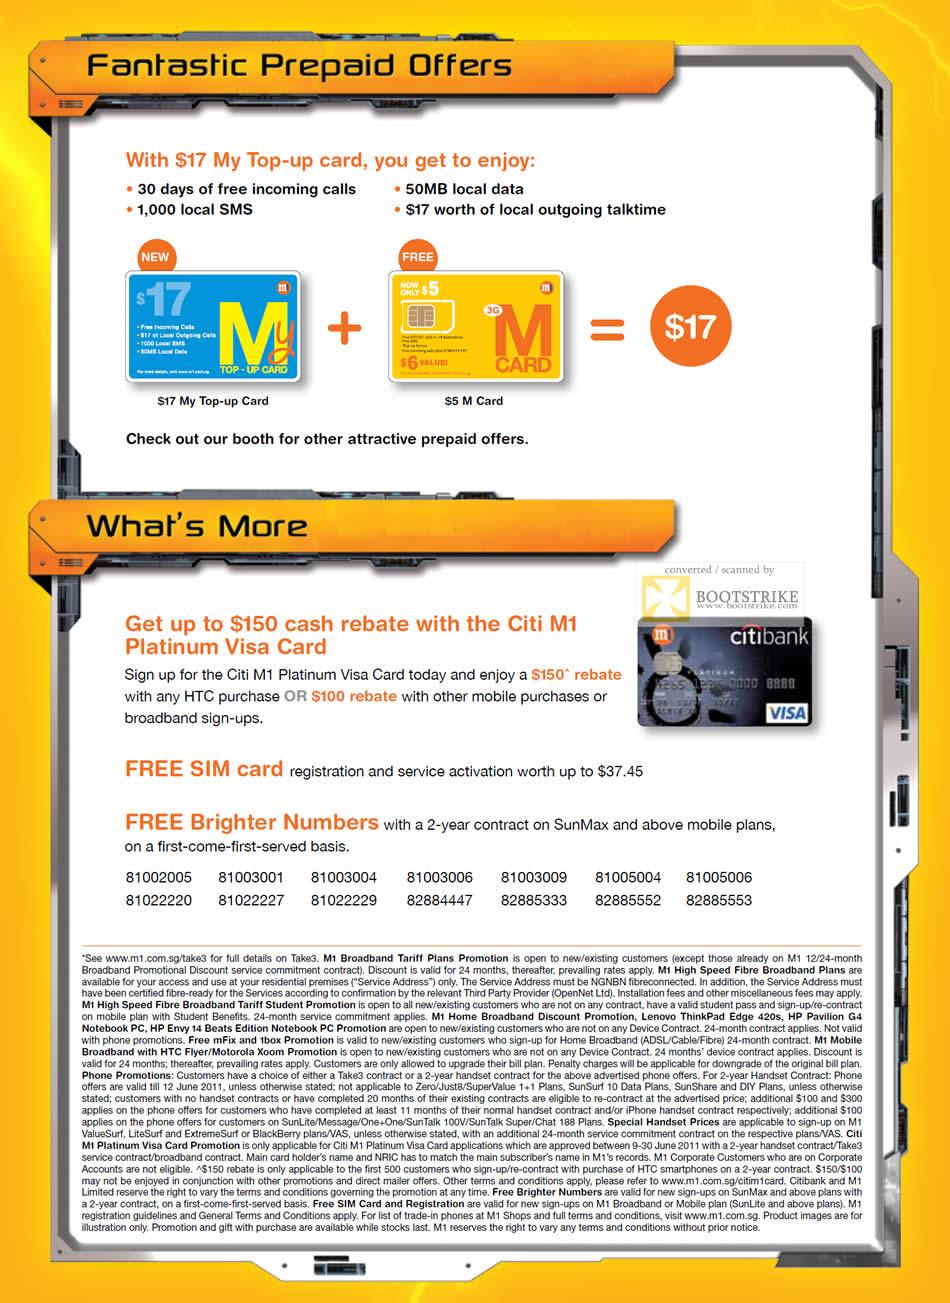 PC Show 2011 price list image brochure of M1 Prepaid My Top-Up Card M Card Citi M1 Platinum Visa